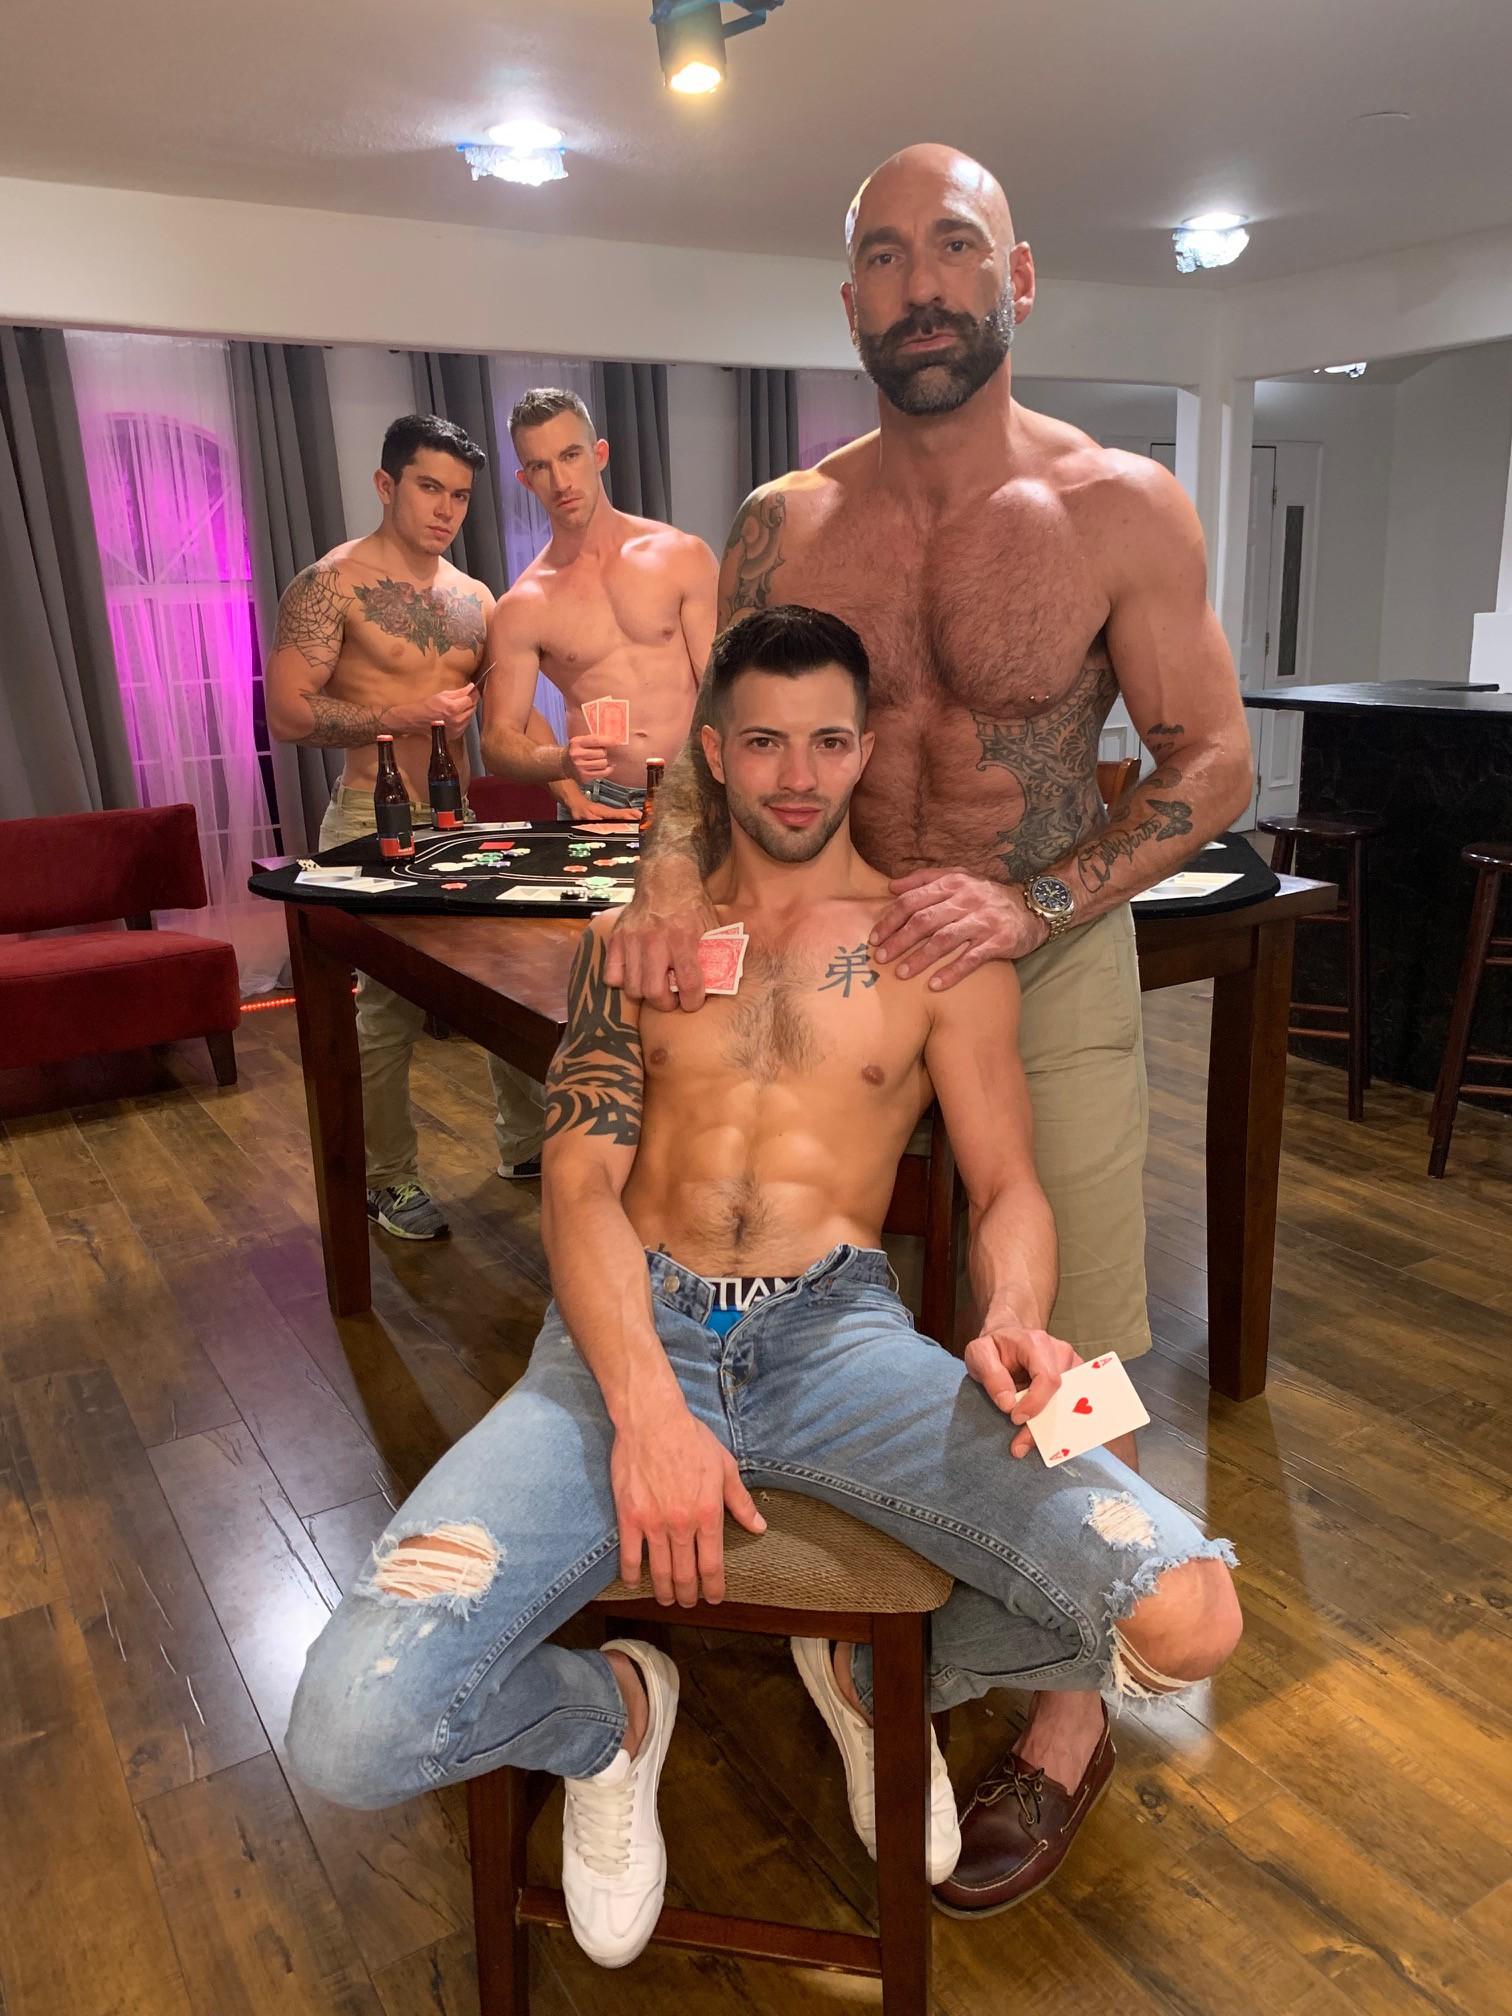 nick fitt fucks clark davis icon male gay porn bareback